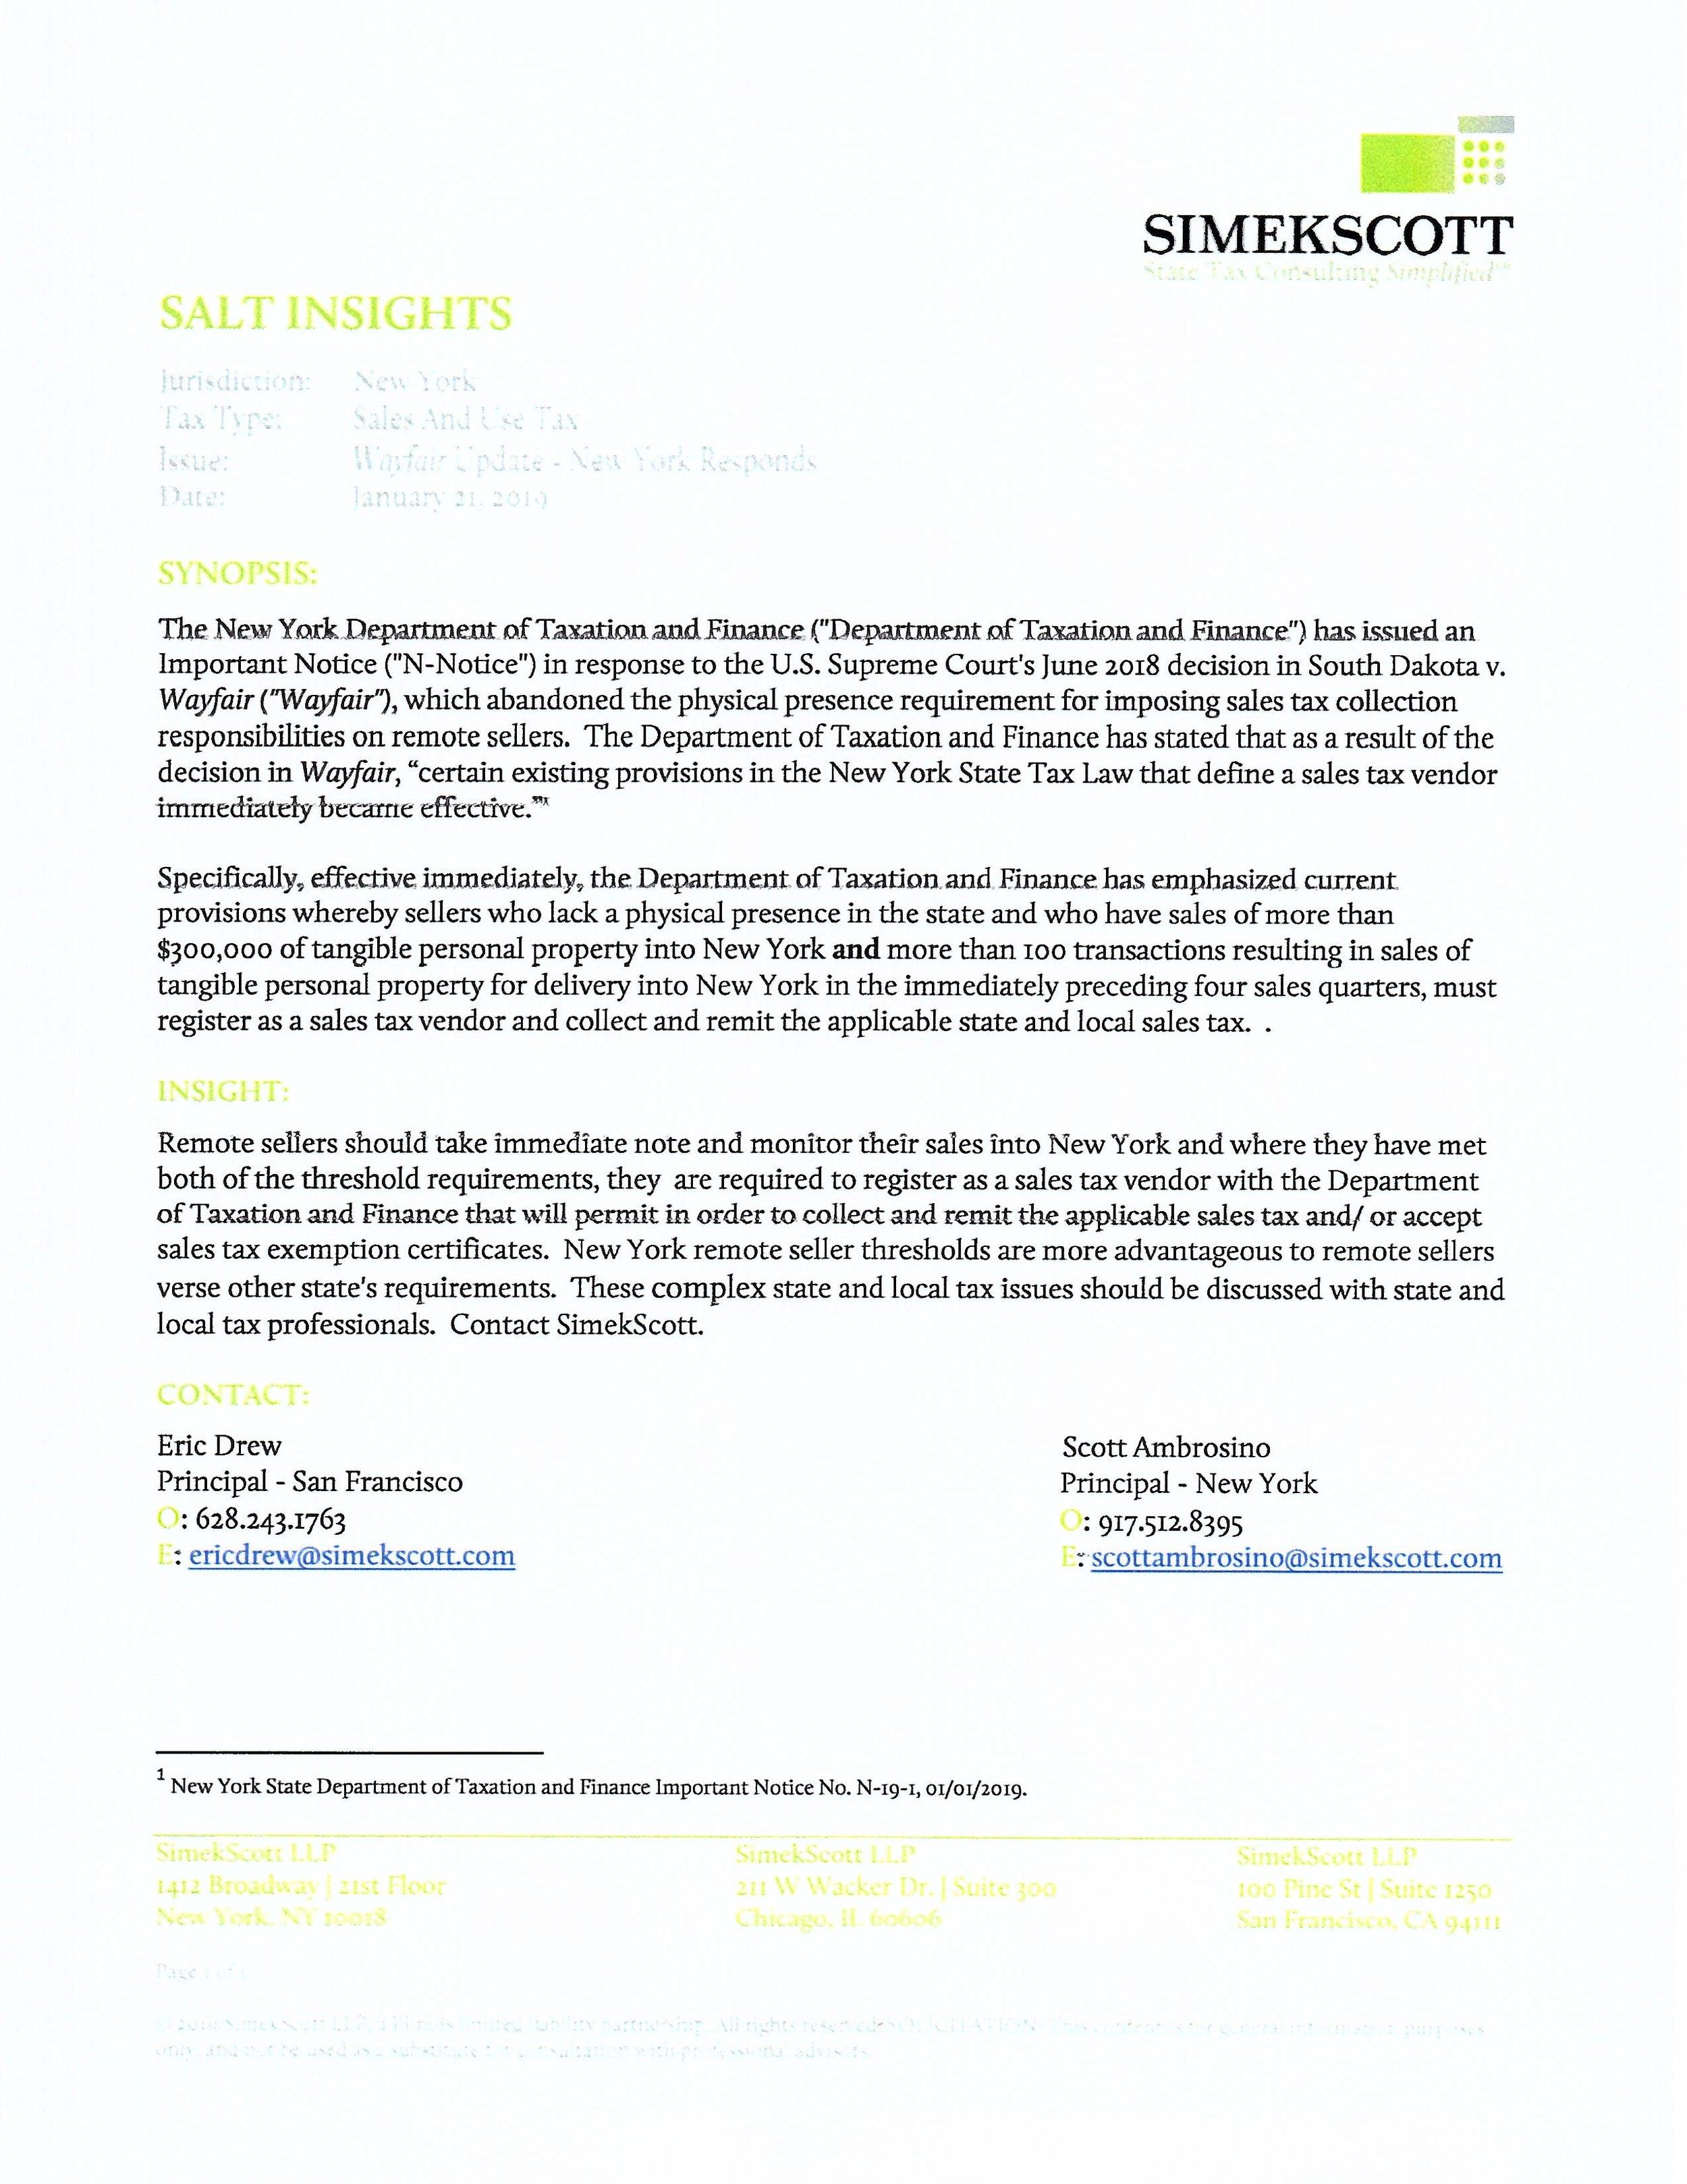 SimekScott_Wayfair_Update_New_York_Responds.jpg